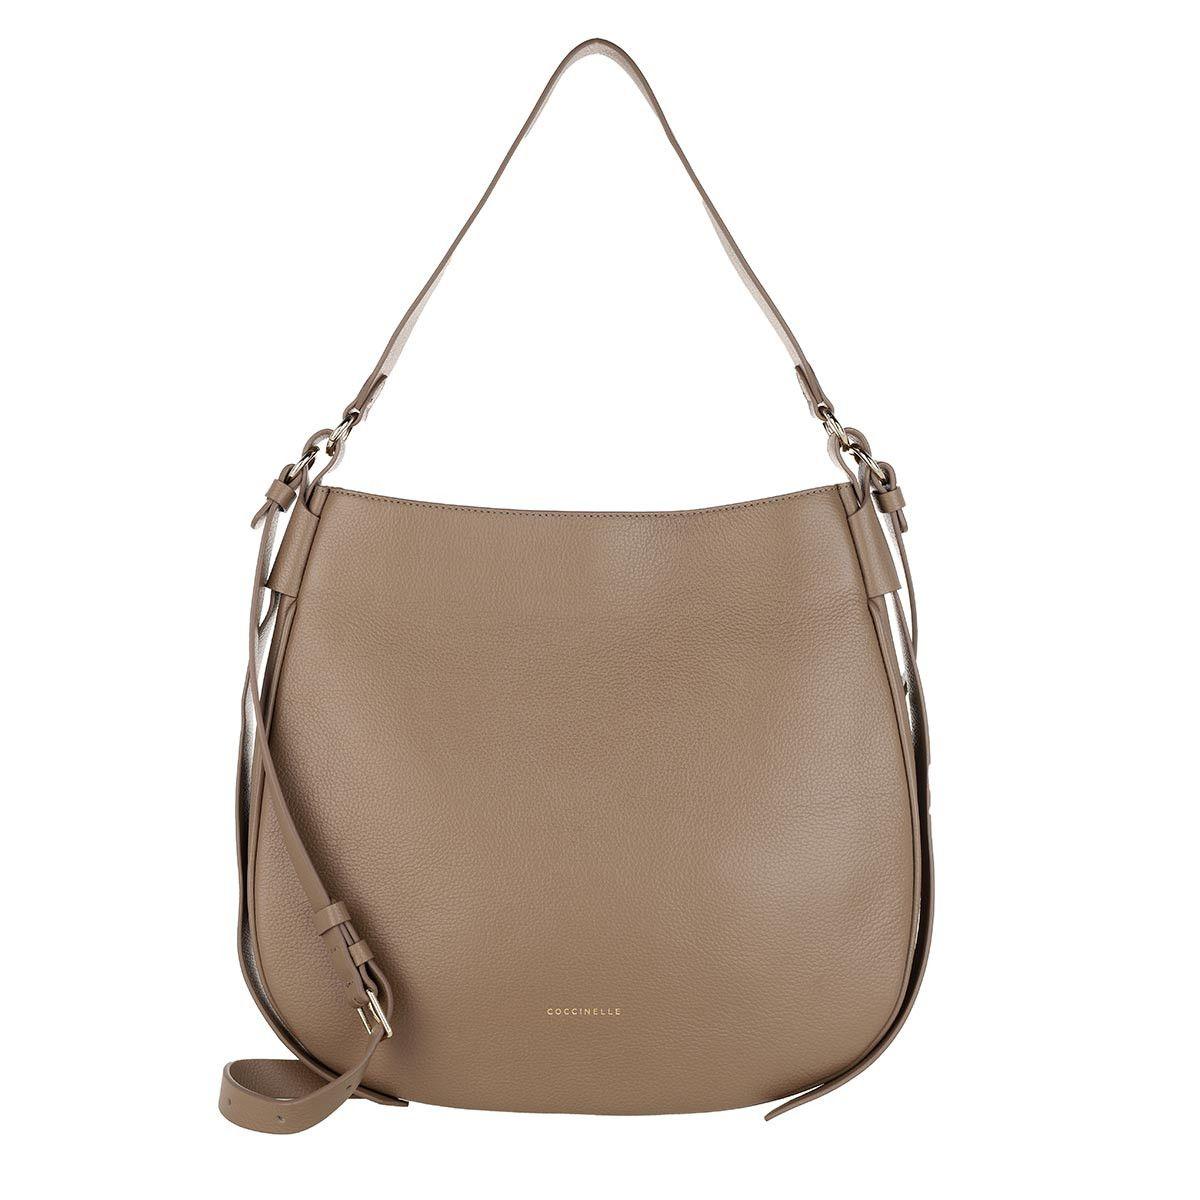 Coccinelle Hobo Bag - Borsa Pelle Vitello Taupe - in beige - für Damen